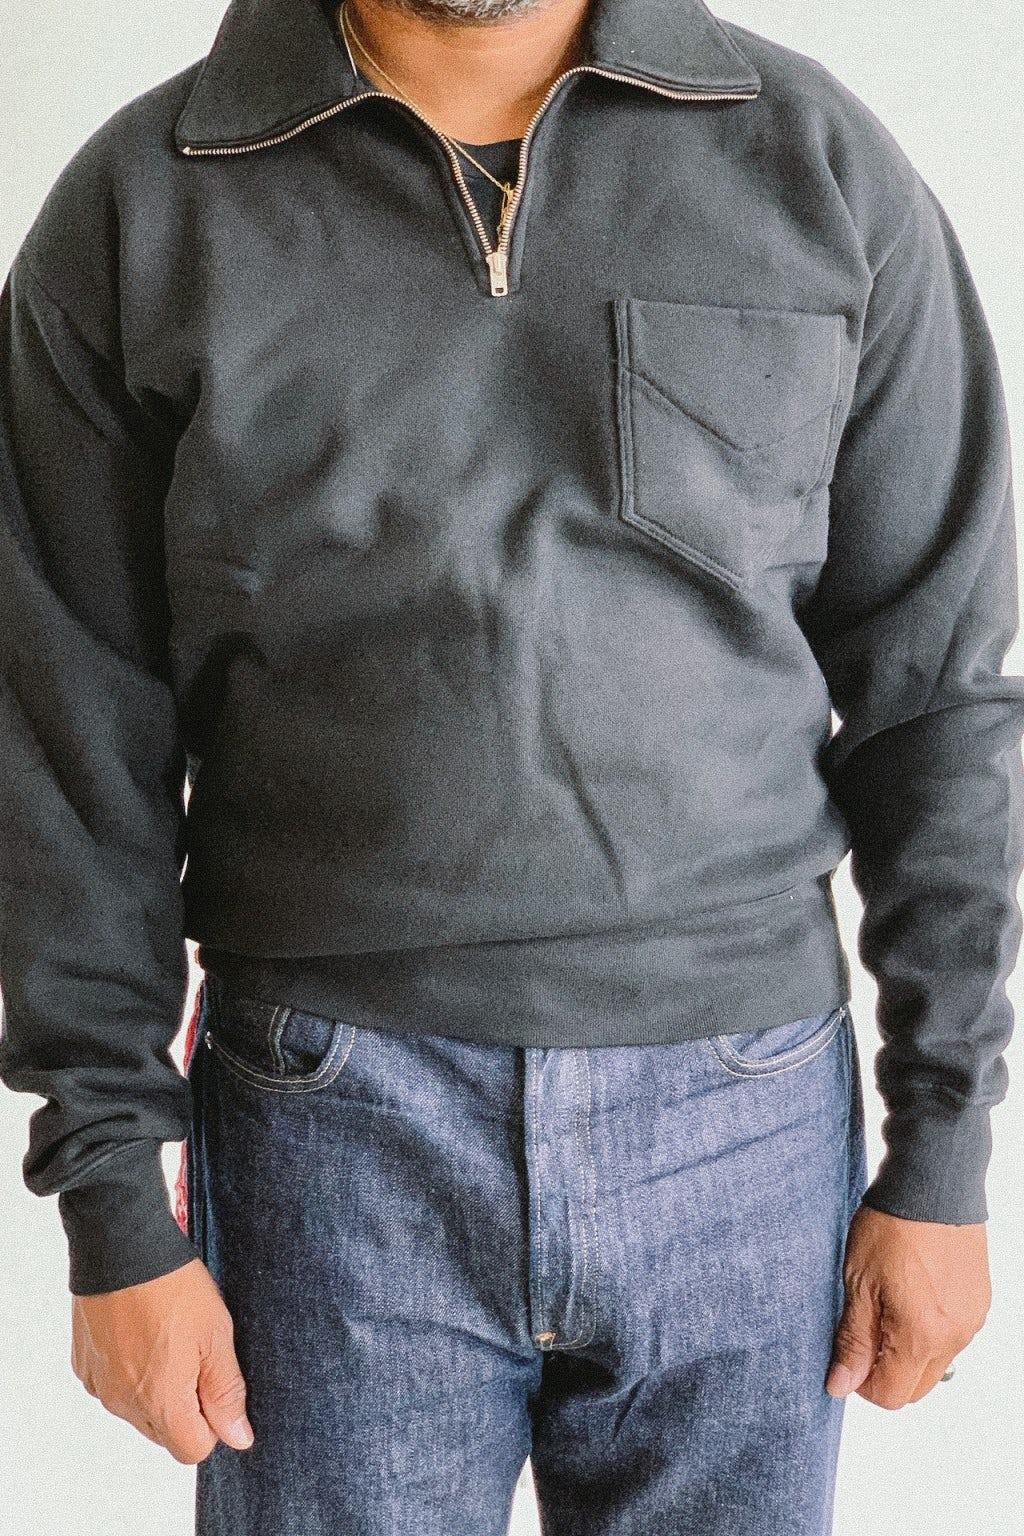 Lady White Co. Quarter Zip Sweatshirt Black